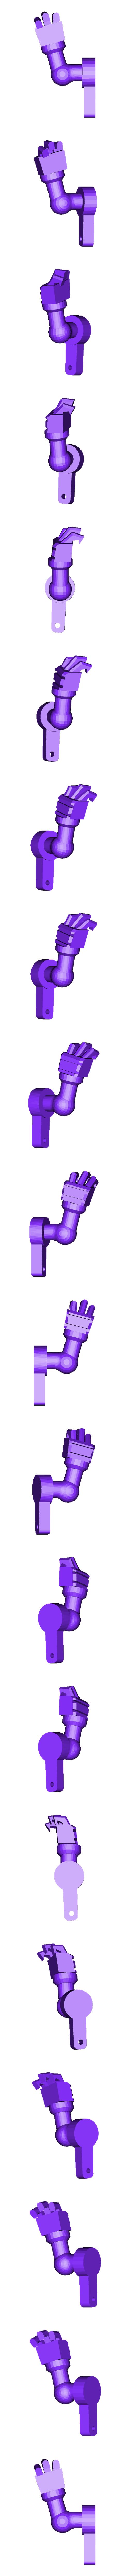 17- G1 ALLICON- LEFT CLAW.stl Download STL file Transformers G1 Allicon (11cm Scale) • 3D print object, mmshightail